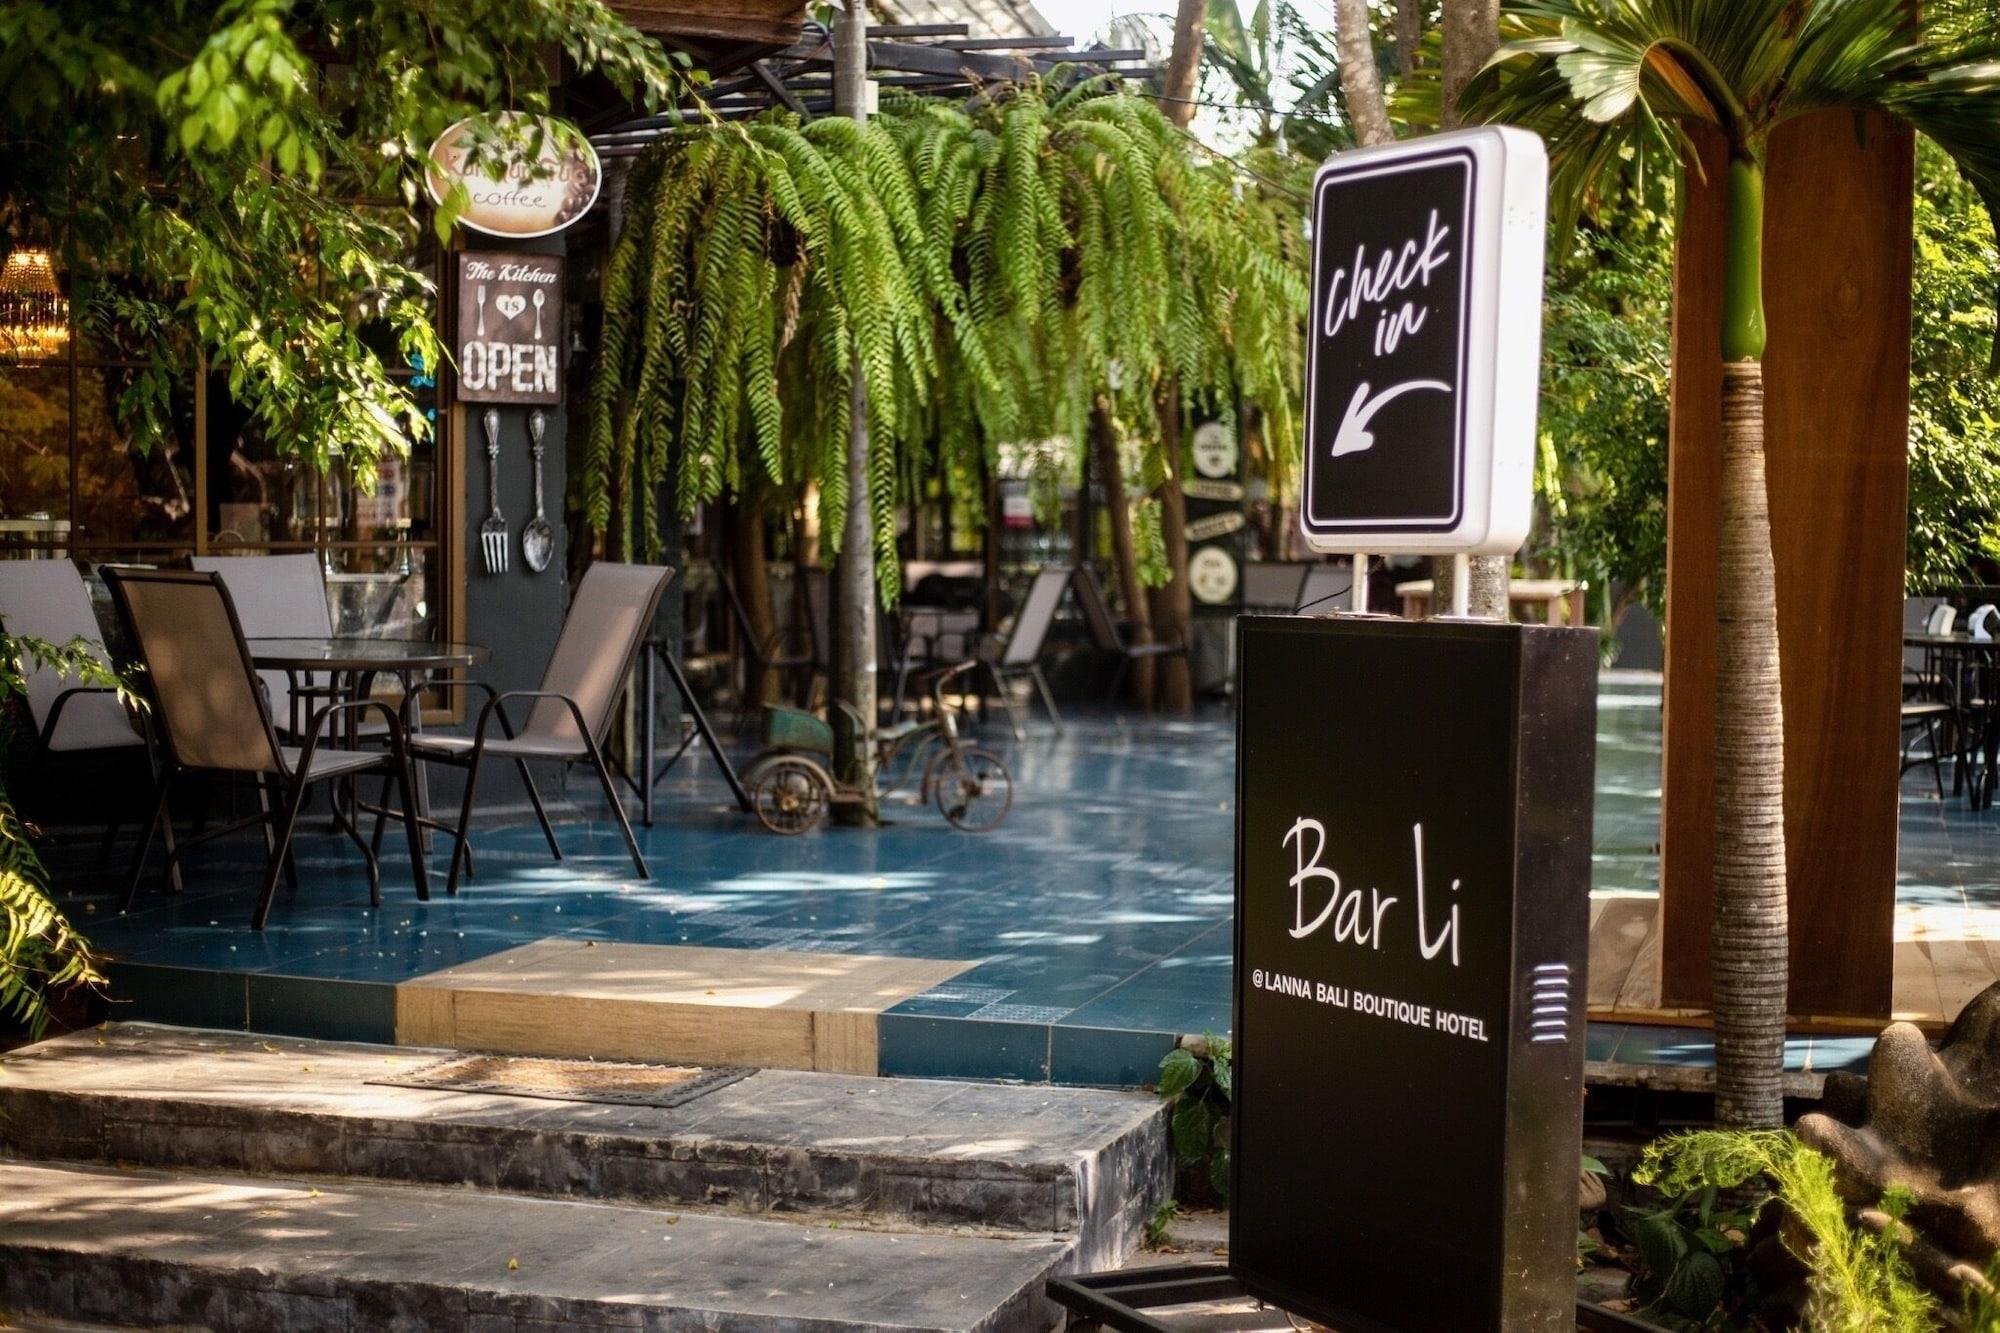 Barli@Lanna Bali Boutique Hotel, Muang Phichit